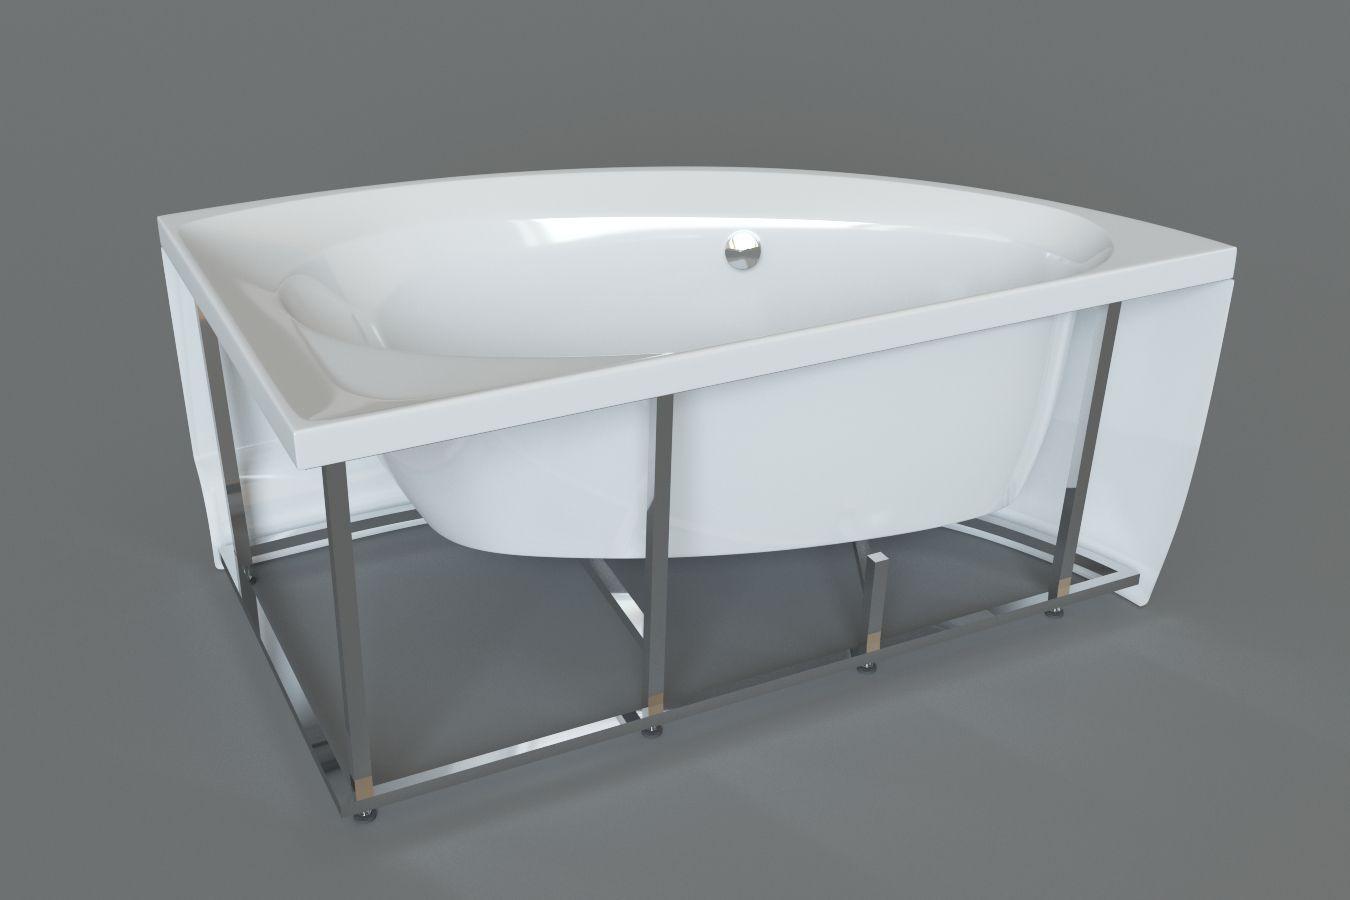 angle idea aquatica plumbing group